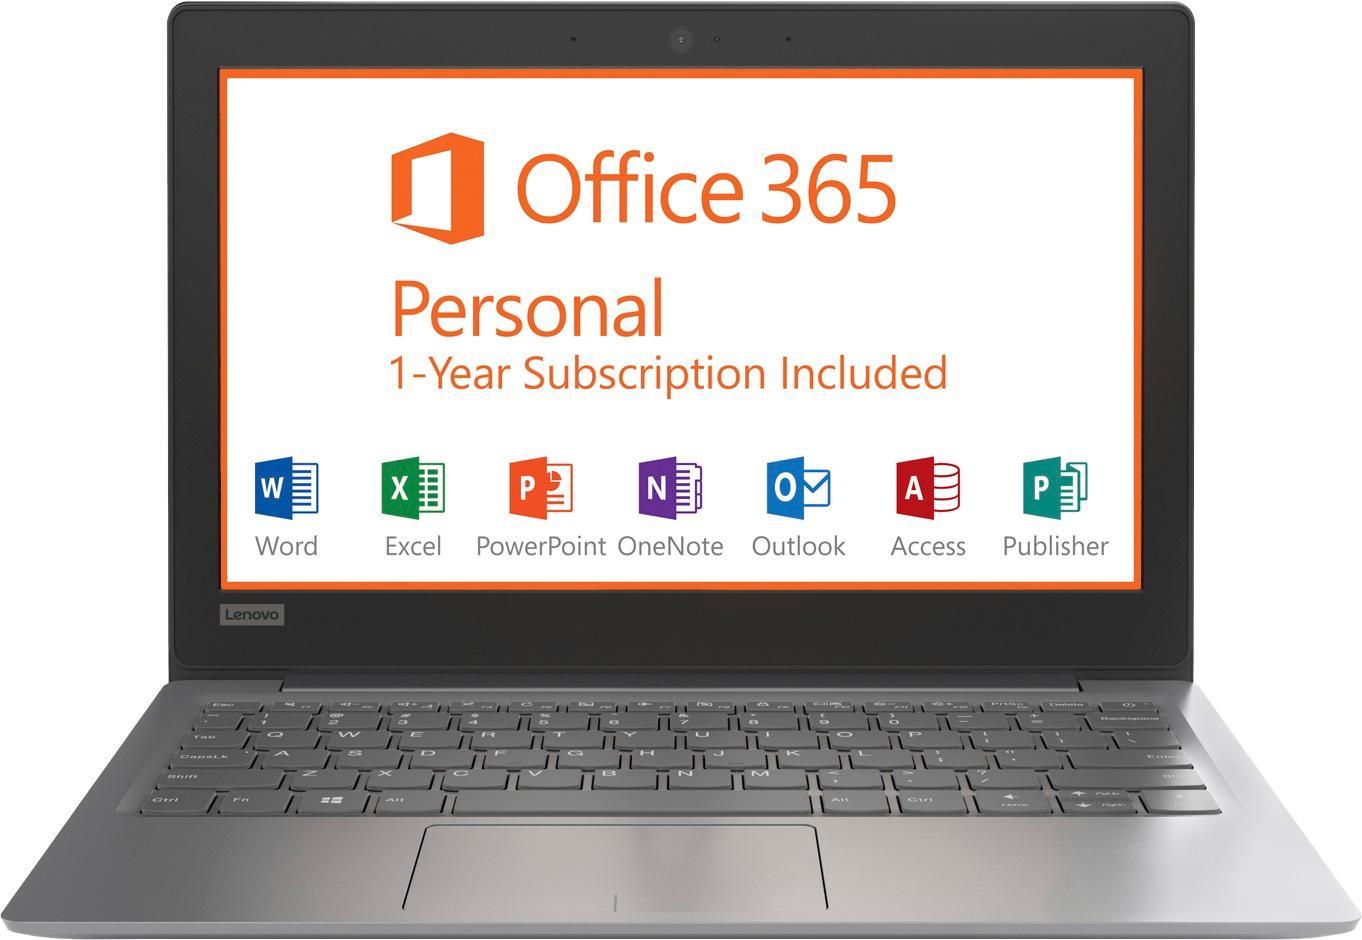 Lenovo ideapad 11.6 laptop @ Best Buy $99